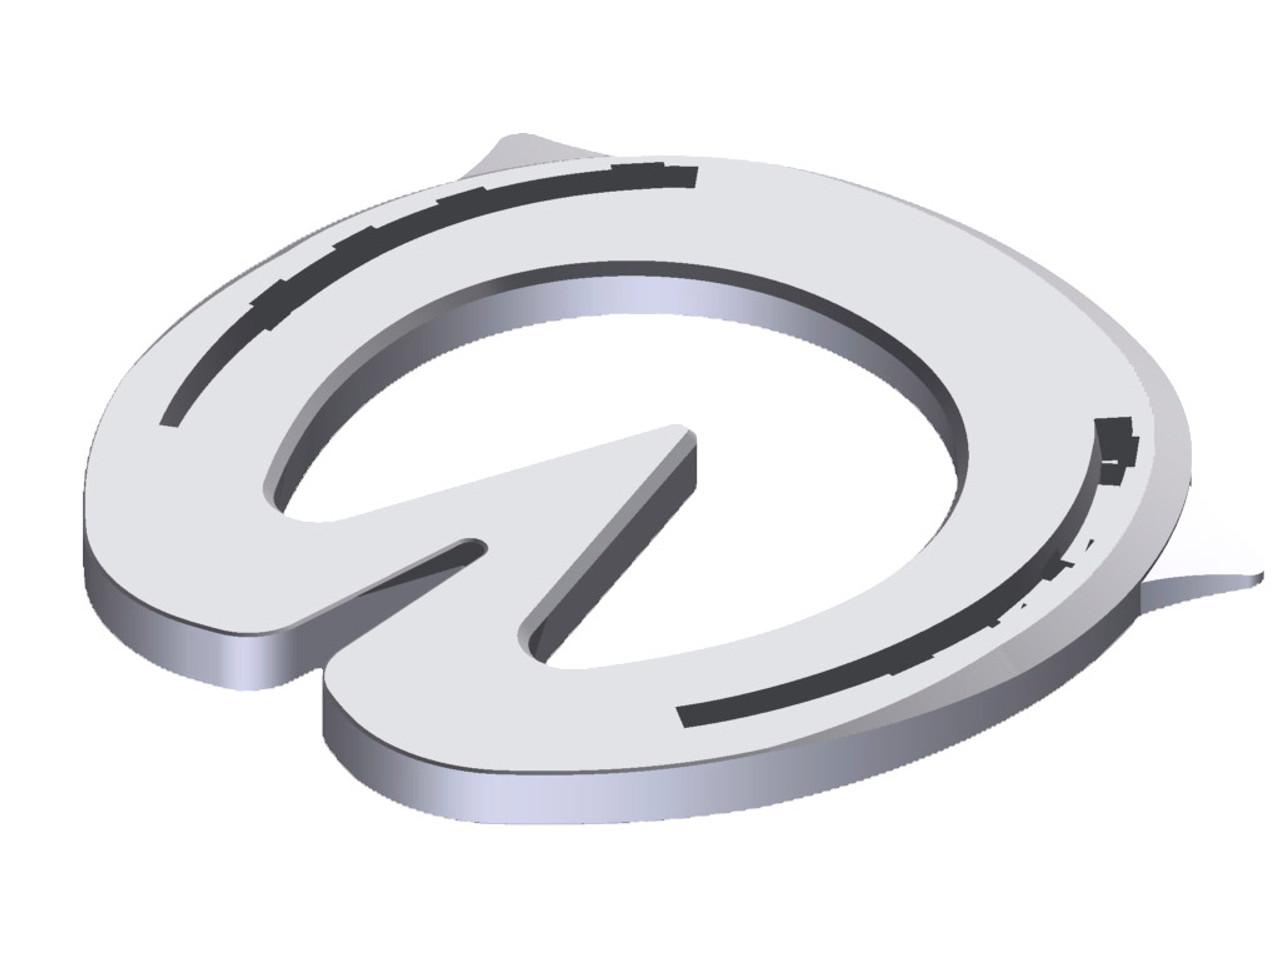 Blacksmith LAKCB Heartbar Universal Un-Clipped